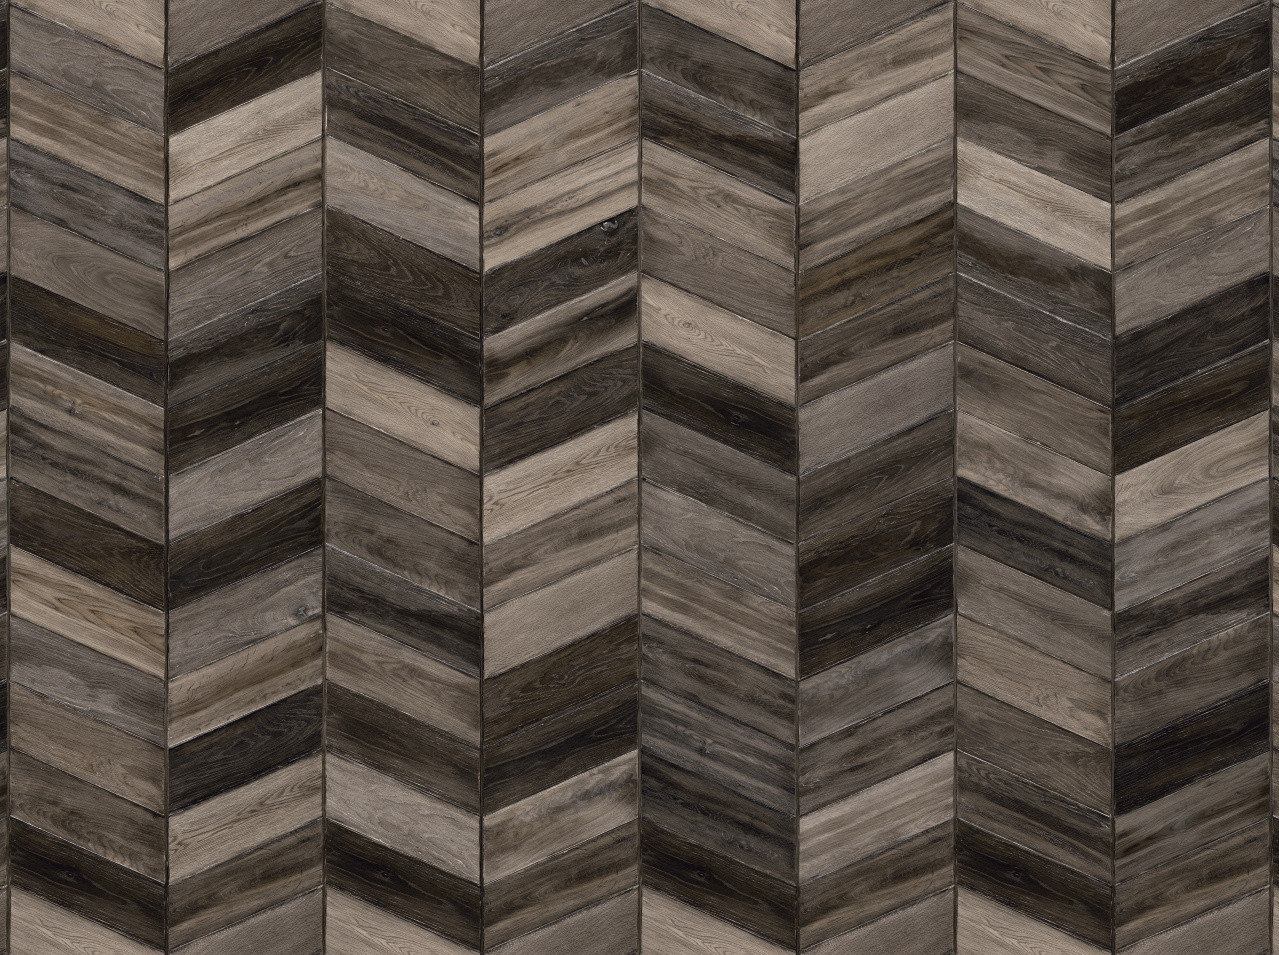 Виниловая плитка IVC Moduleo Impress Bohemian 61974 французская елка